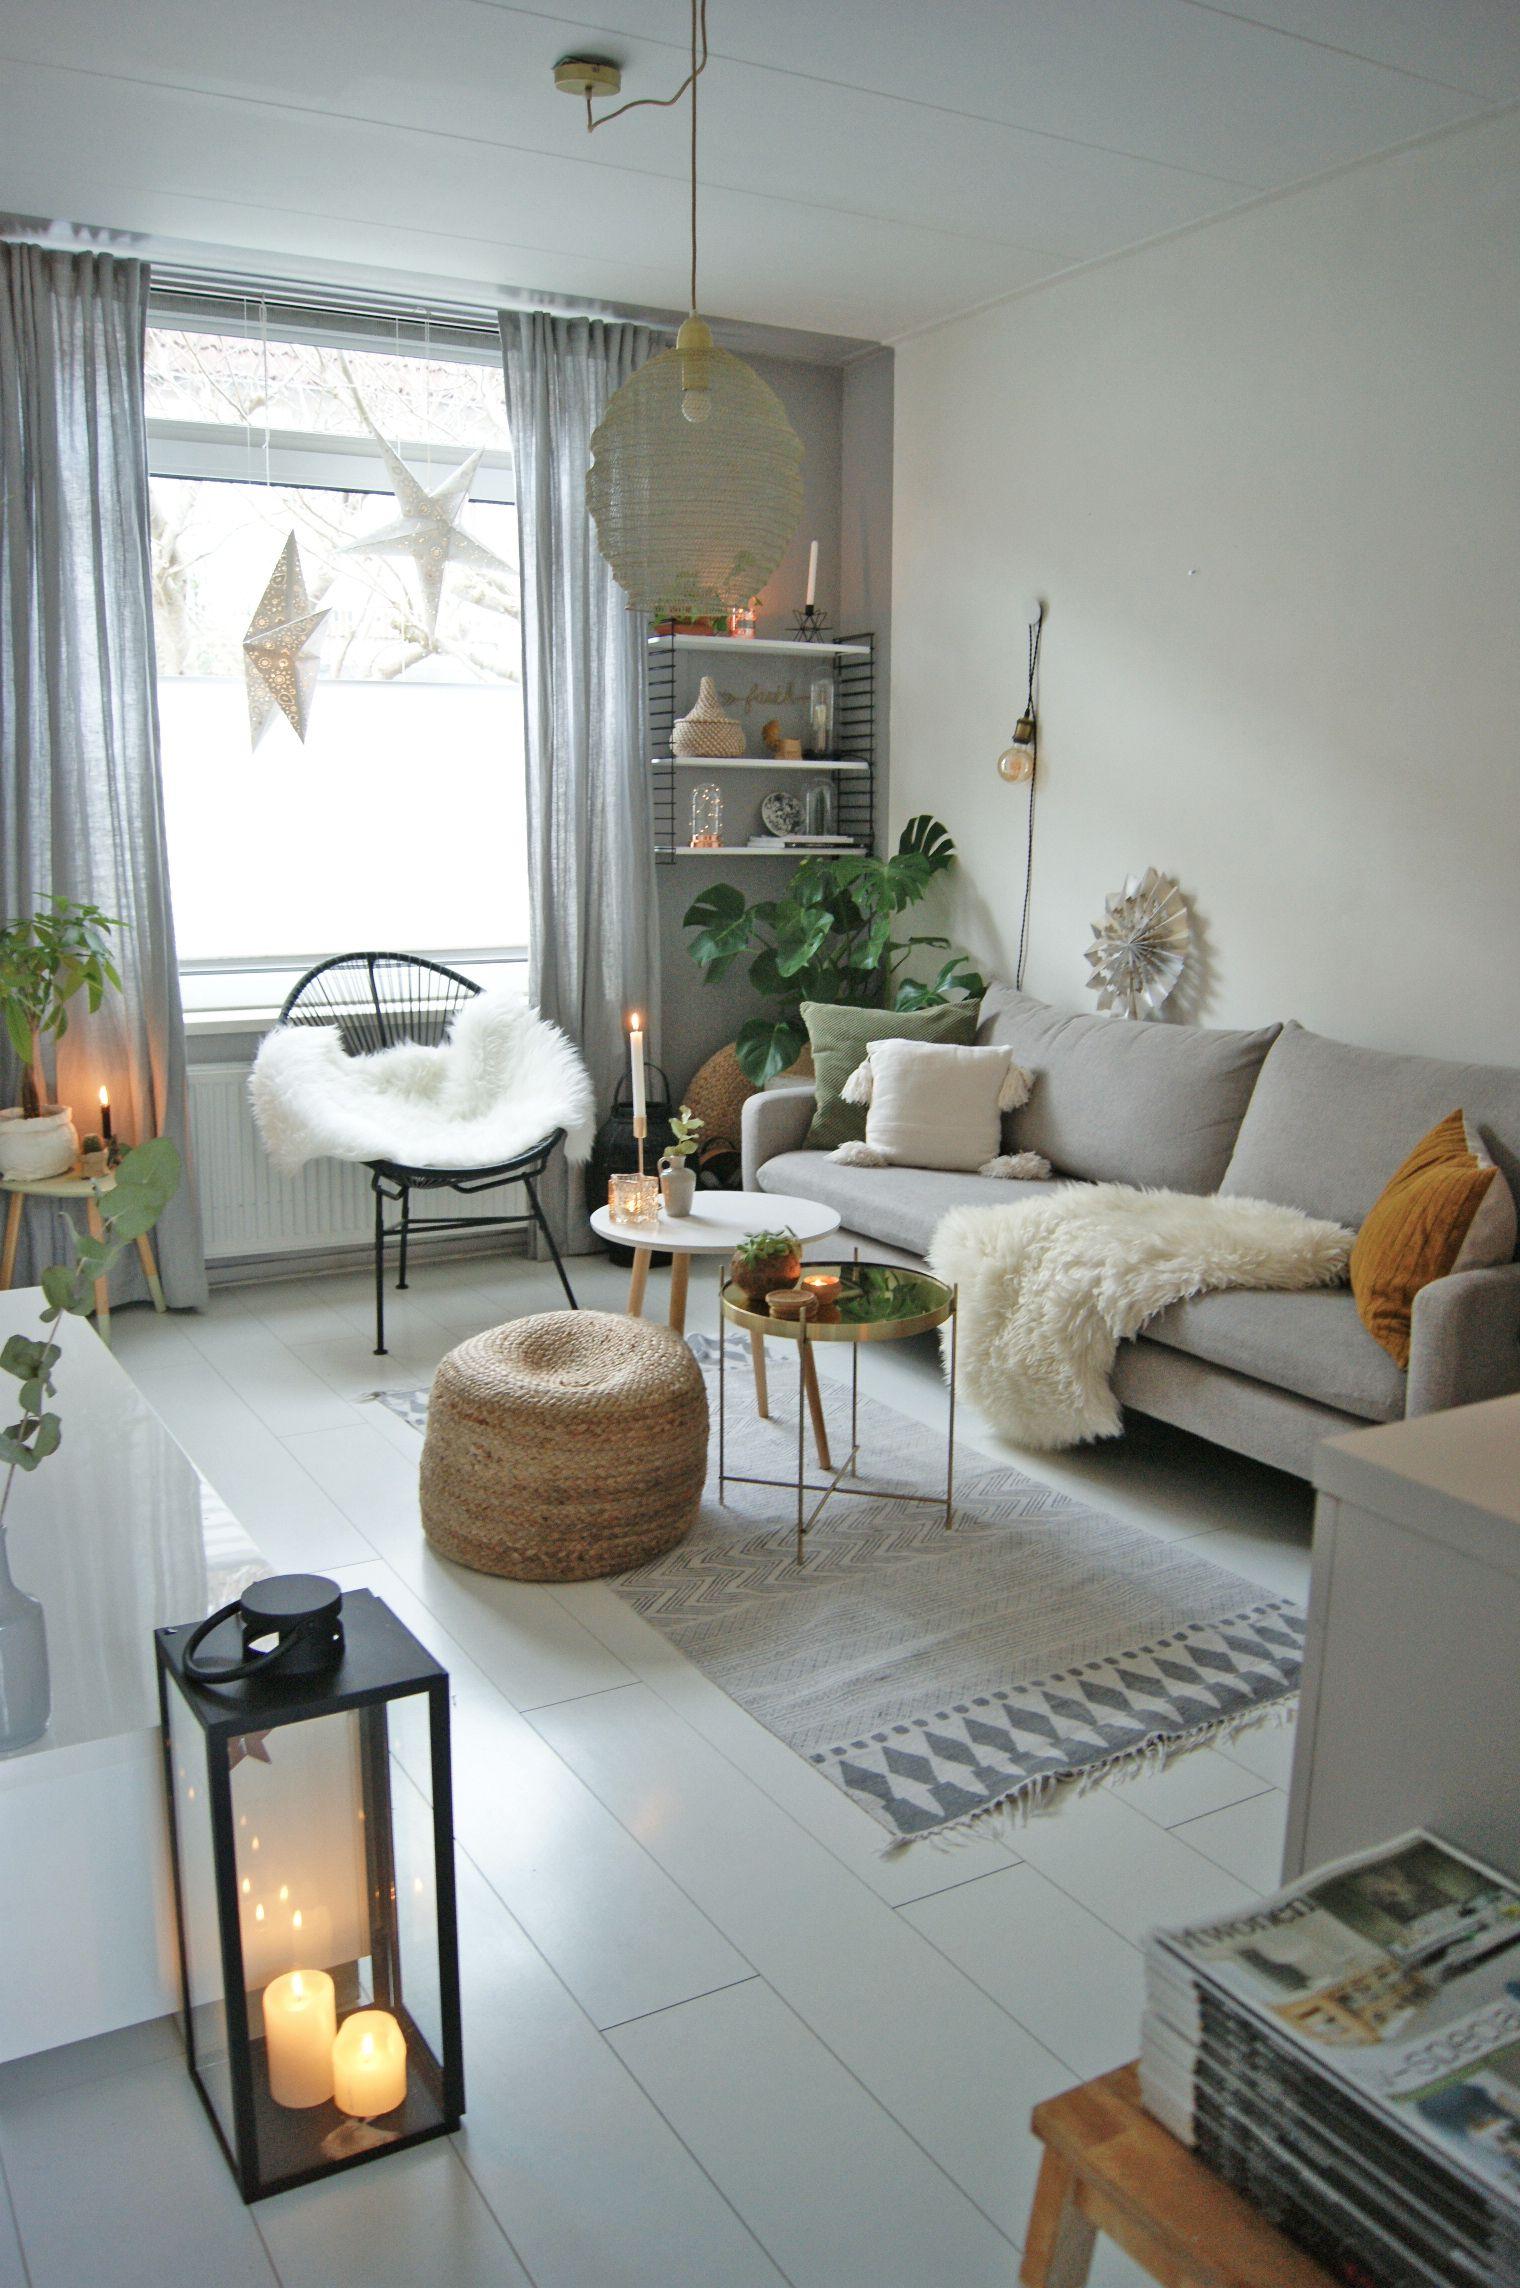 Woonkamer - Binnenkijken bij siefshome - woonkamer | Pinterest ...